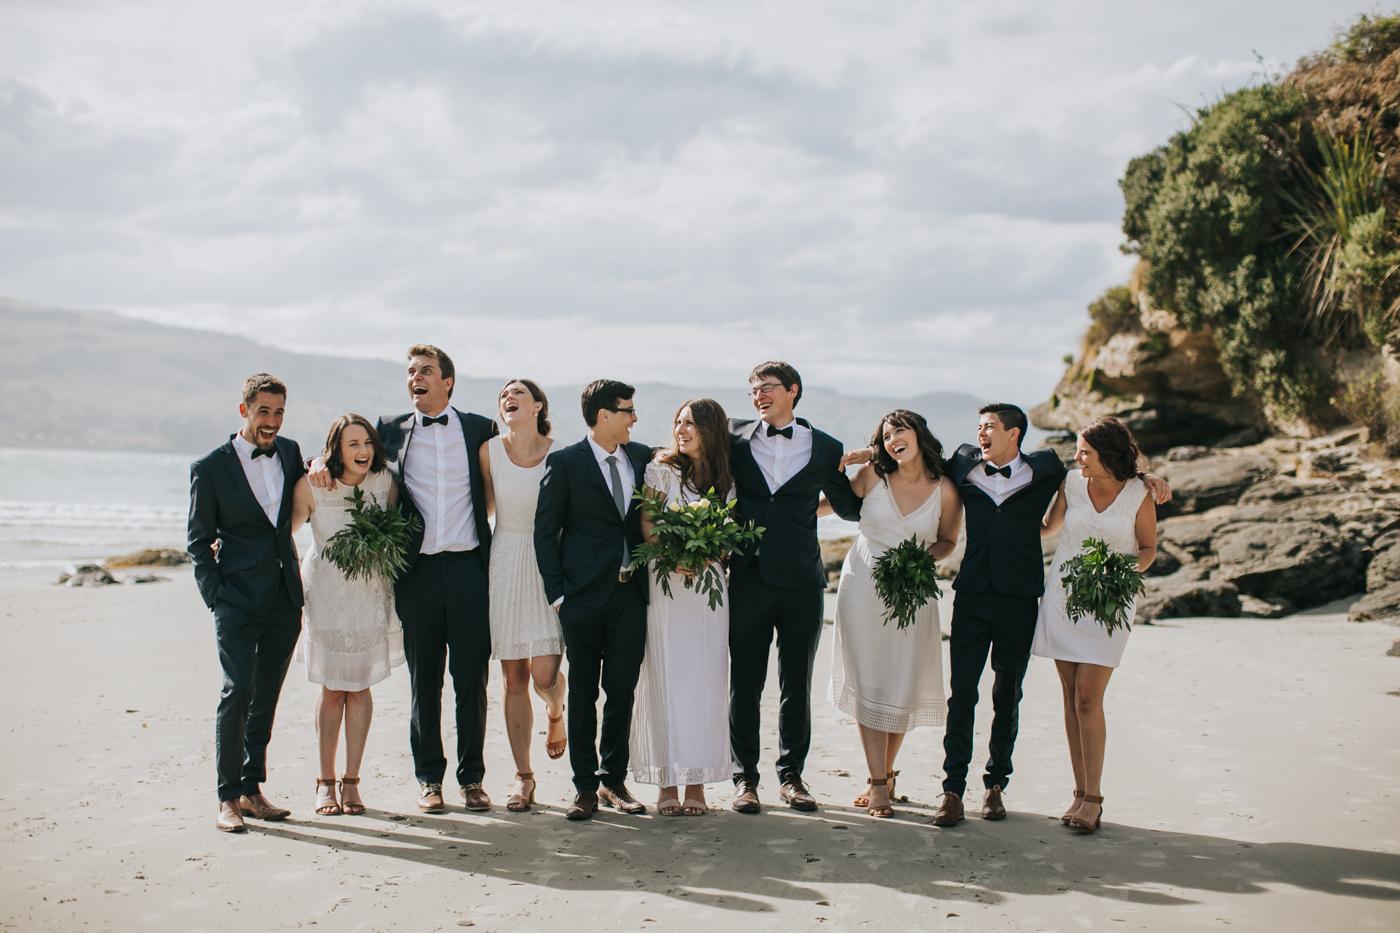 Ariana & Tim - Dunedin, New Zealand Wedding - Destination Wedding - Samantha Heather Photography-124.jpg